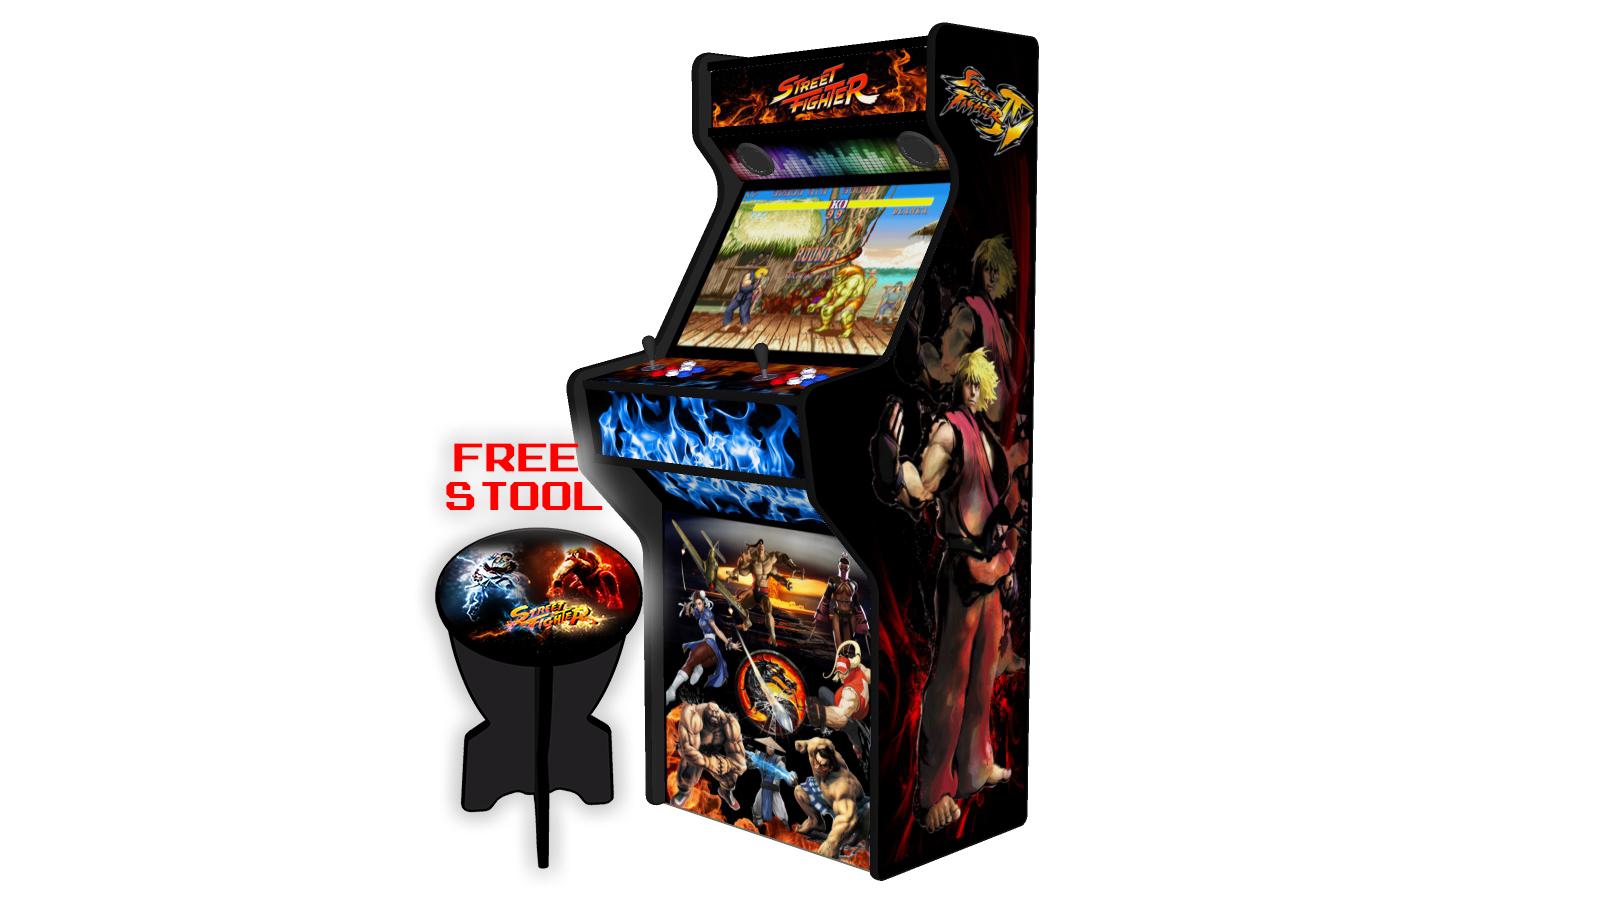 Street-Fighter-27-Inch-Upright-Arcade-Machine-American-Style-Joysticks-Black-Tmold-Right-free-stool